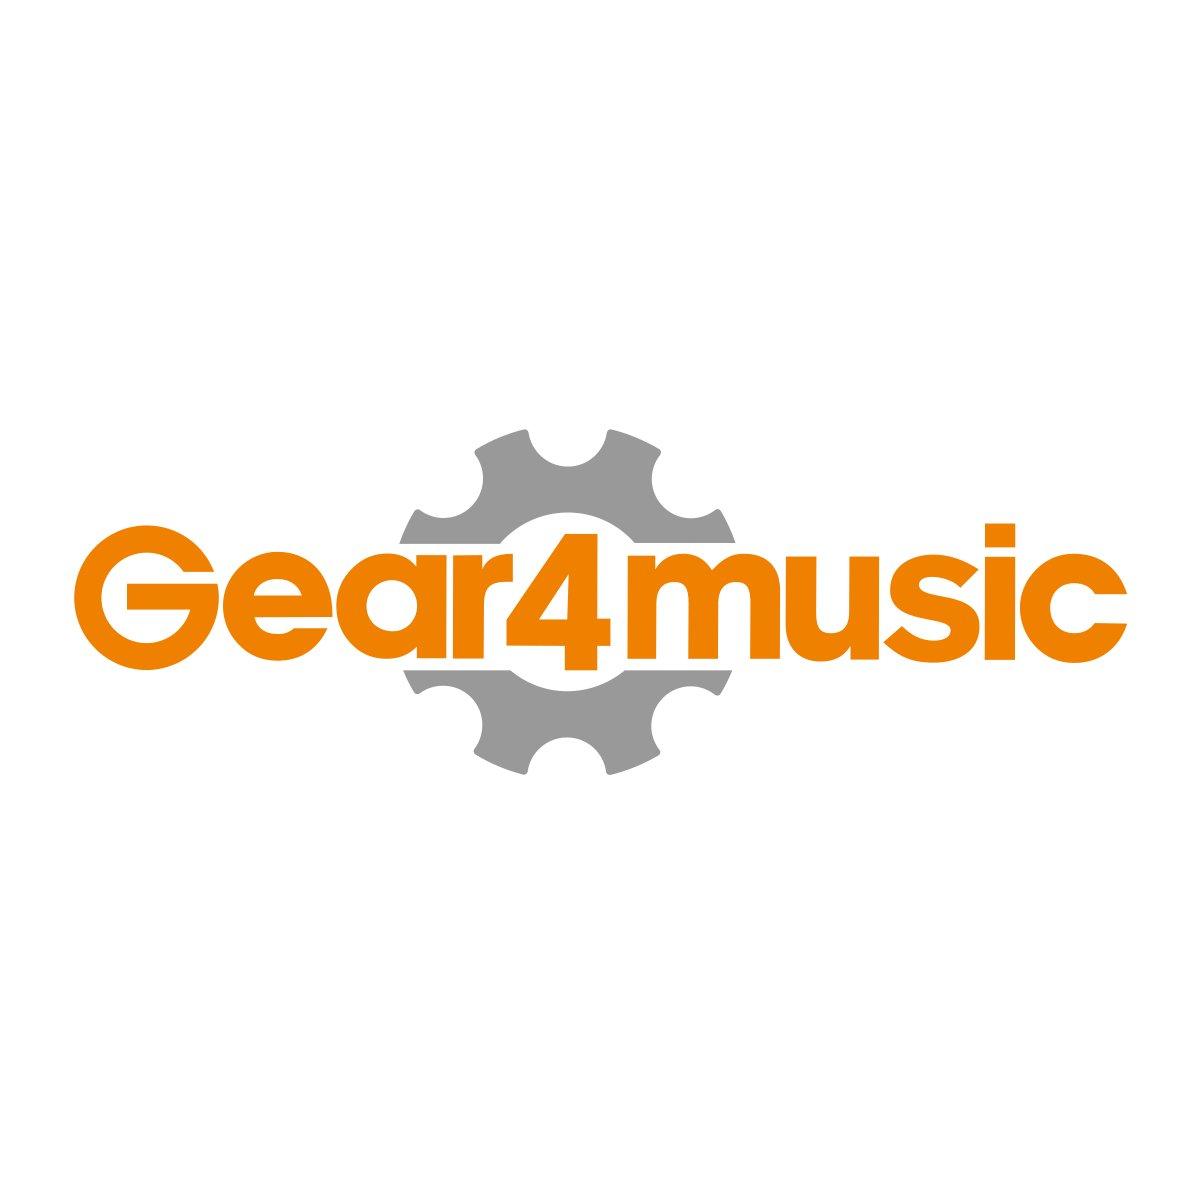 3/4 Gear4music Electric Guitar Amp Pack, Black